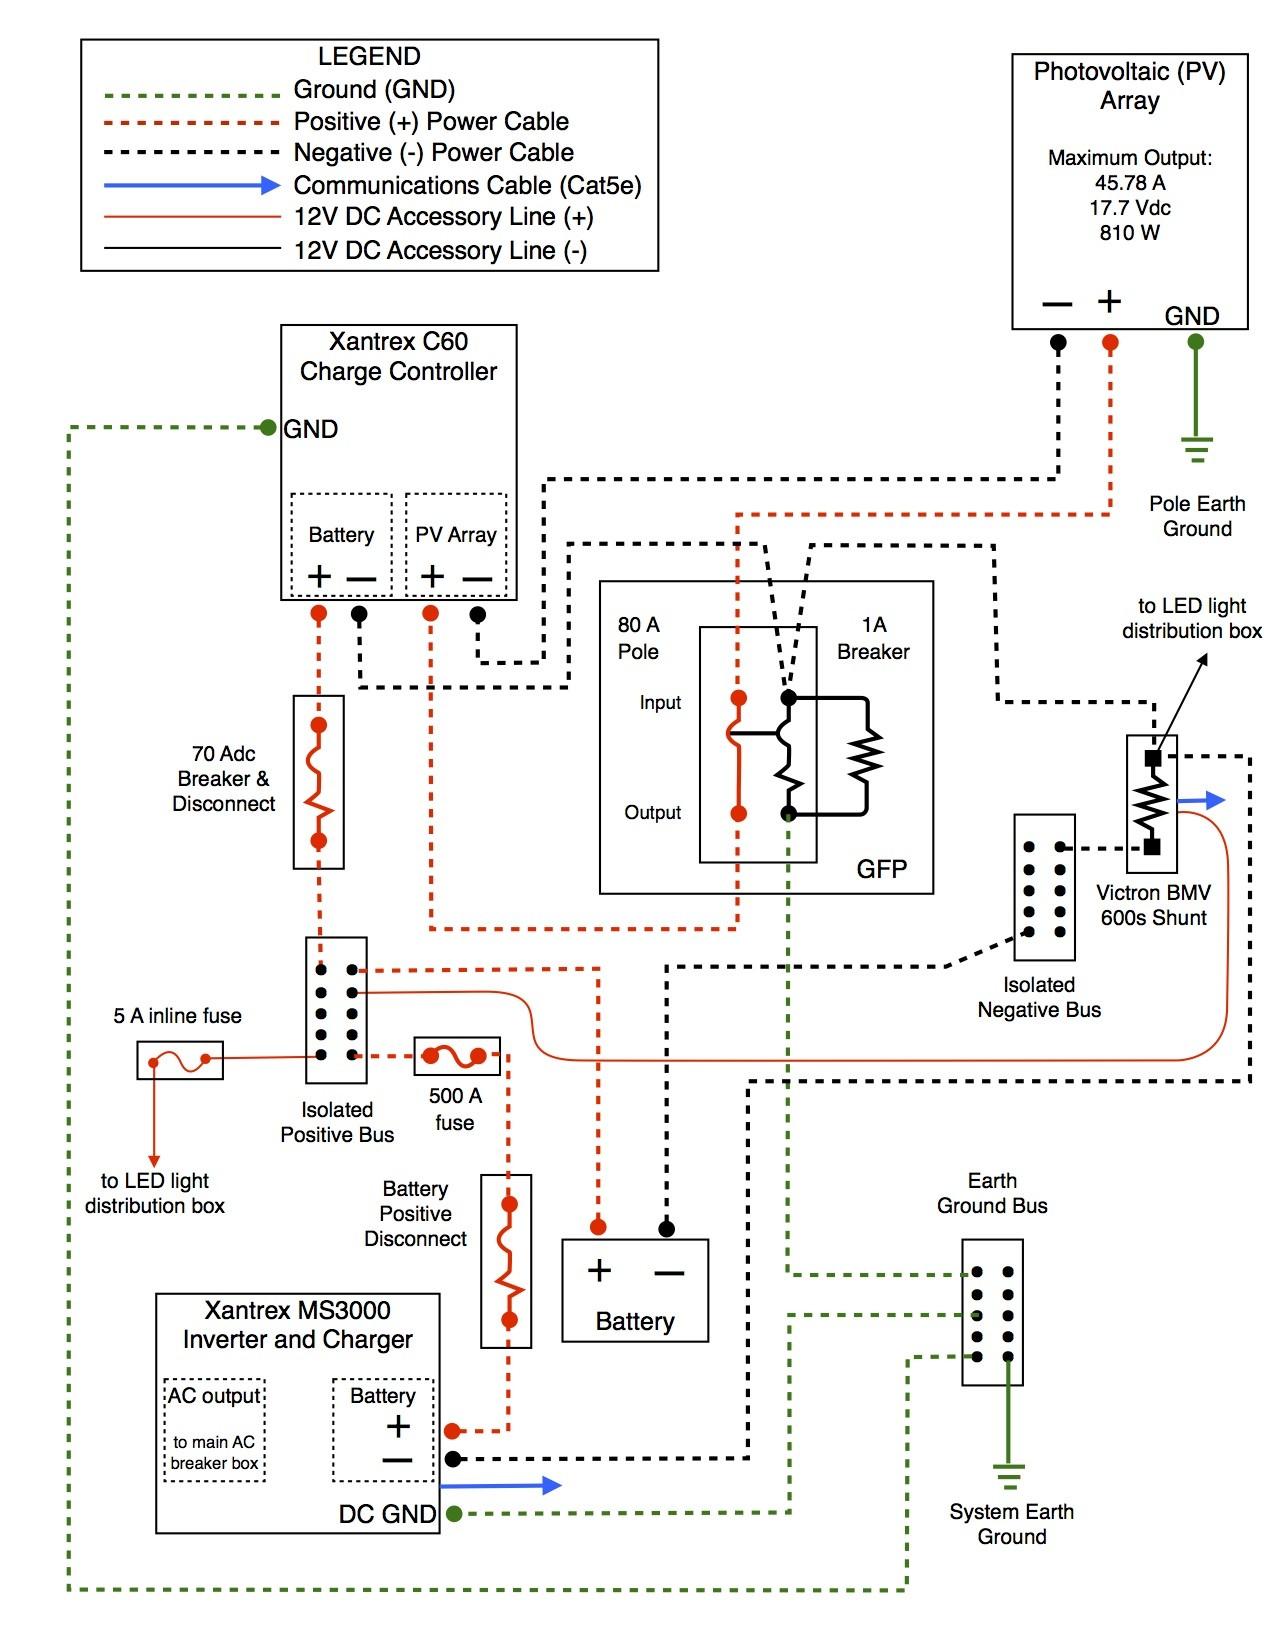 3 wire circuit diagram inverter wiring diagram ups amp inverter 3 wire circuit diagram inverter wiring diagram ups amp inverter wiring diagram for e room swarovskicordoba Images